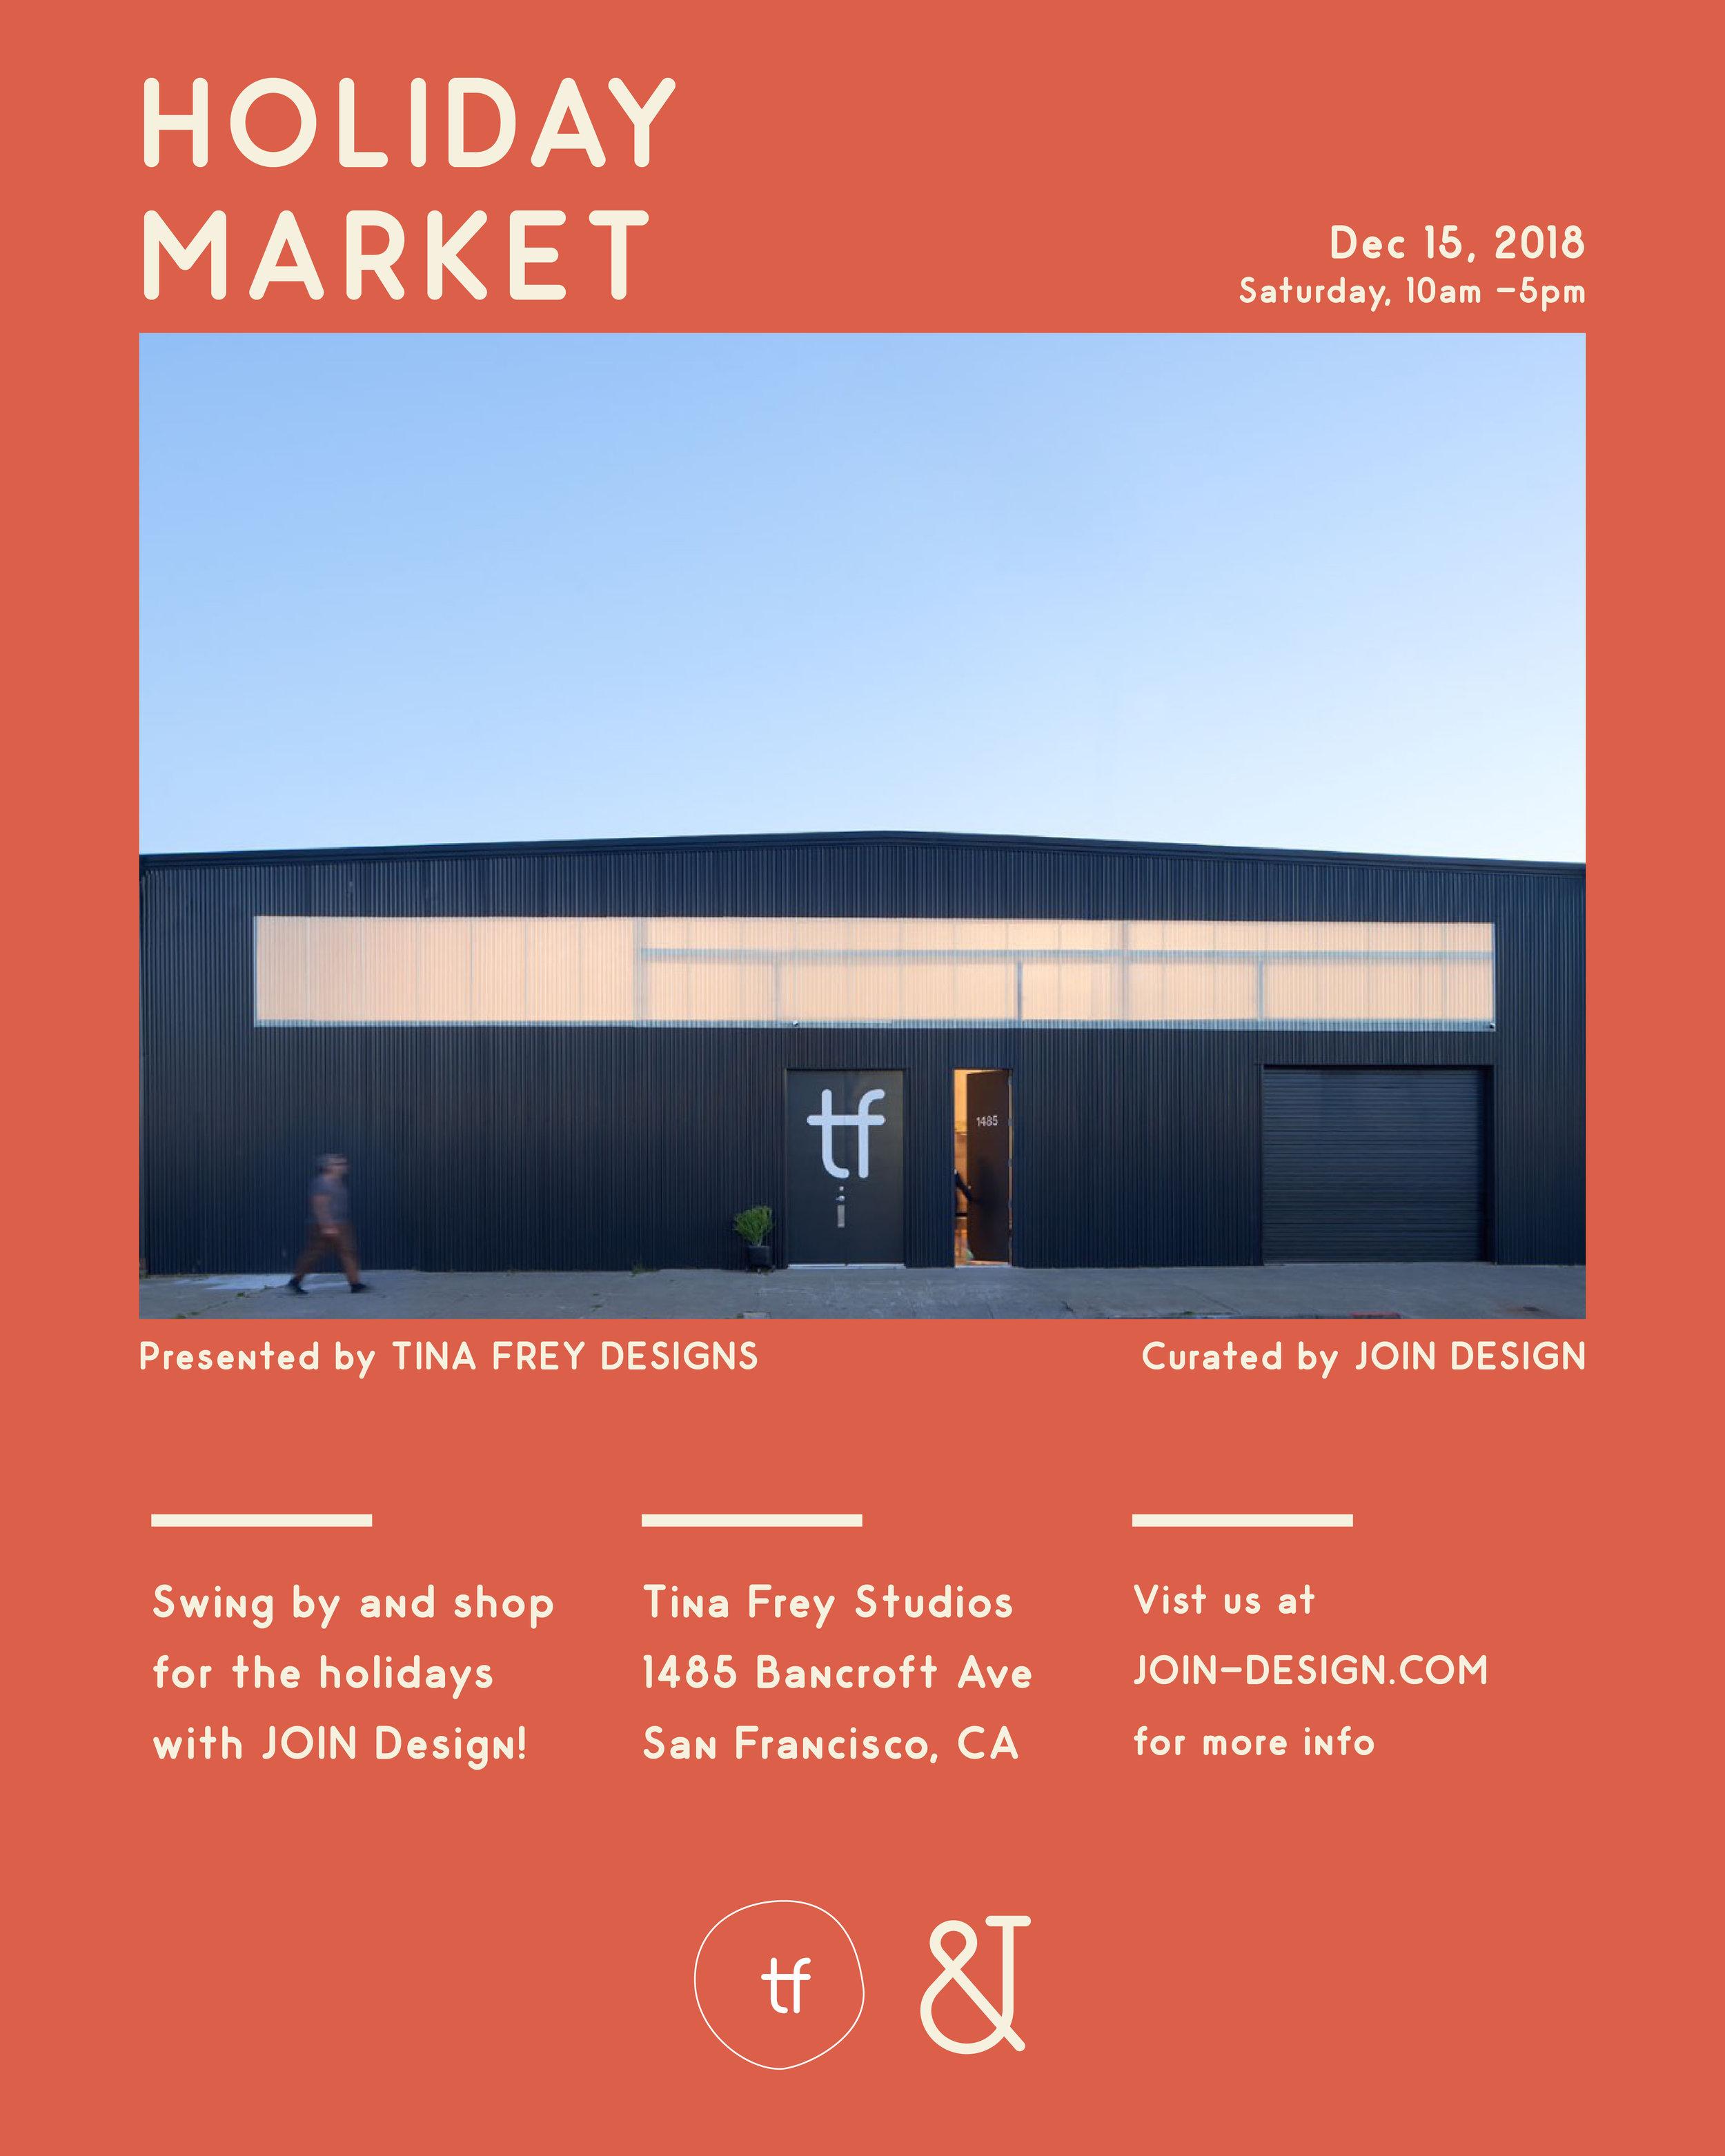 JOINHolidayMarket_Graphic_2018_FINAL.jpg